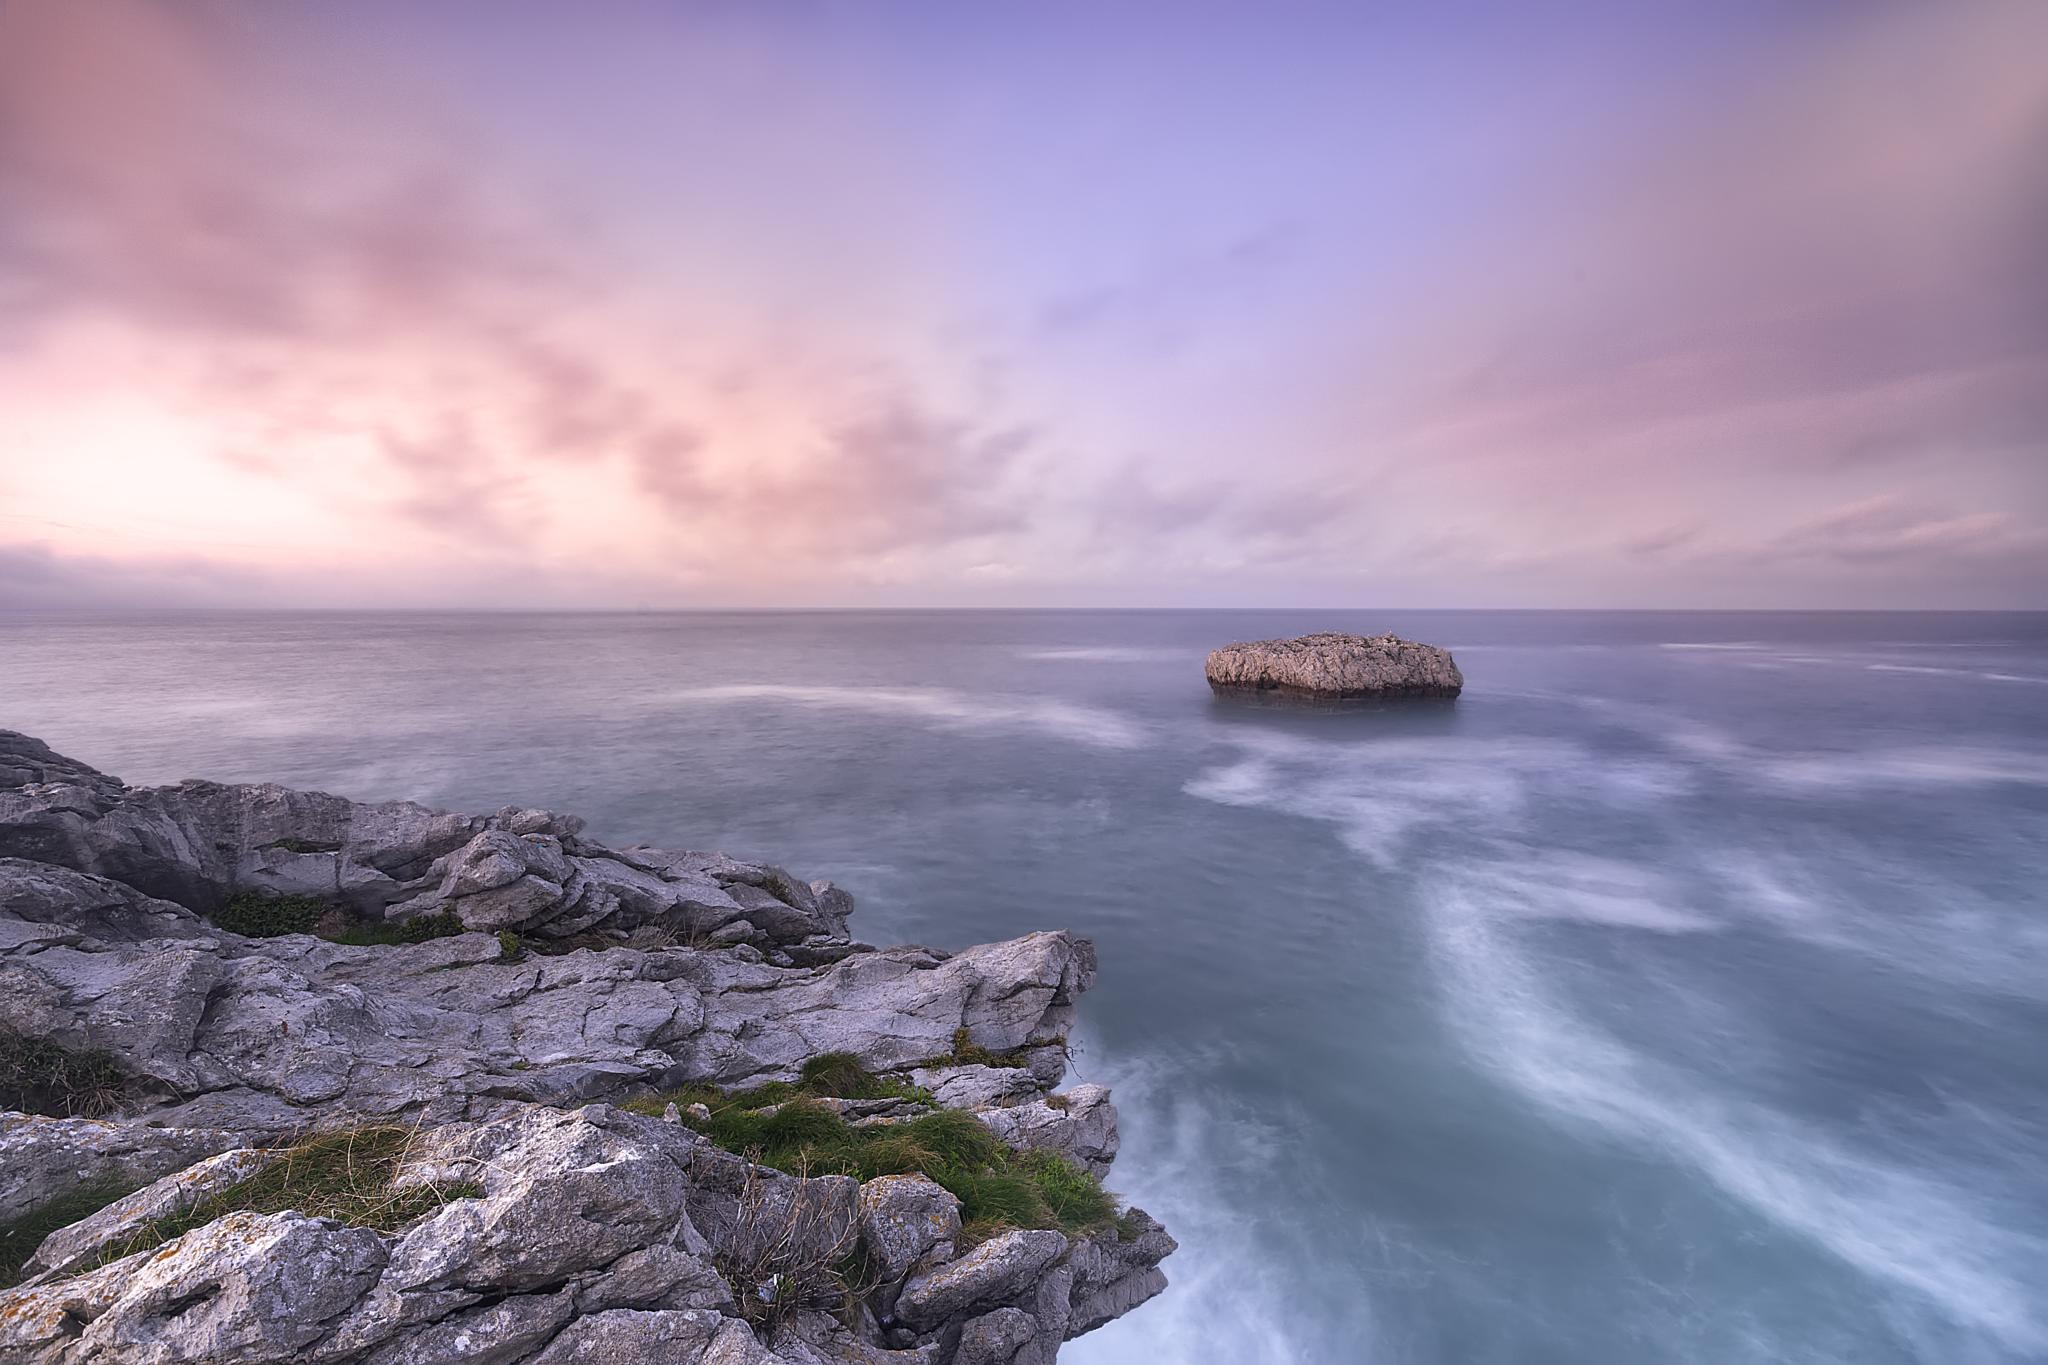 THE ISLAND by jorgegonzalezherrera18